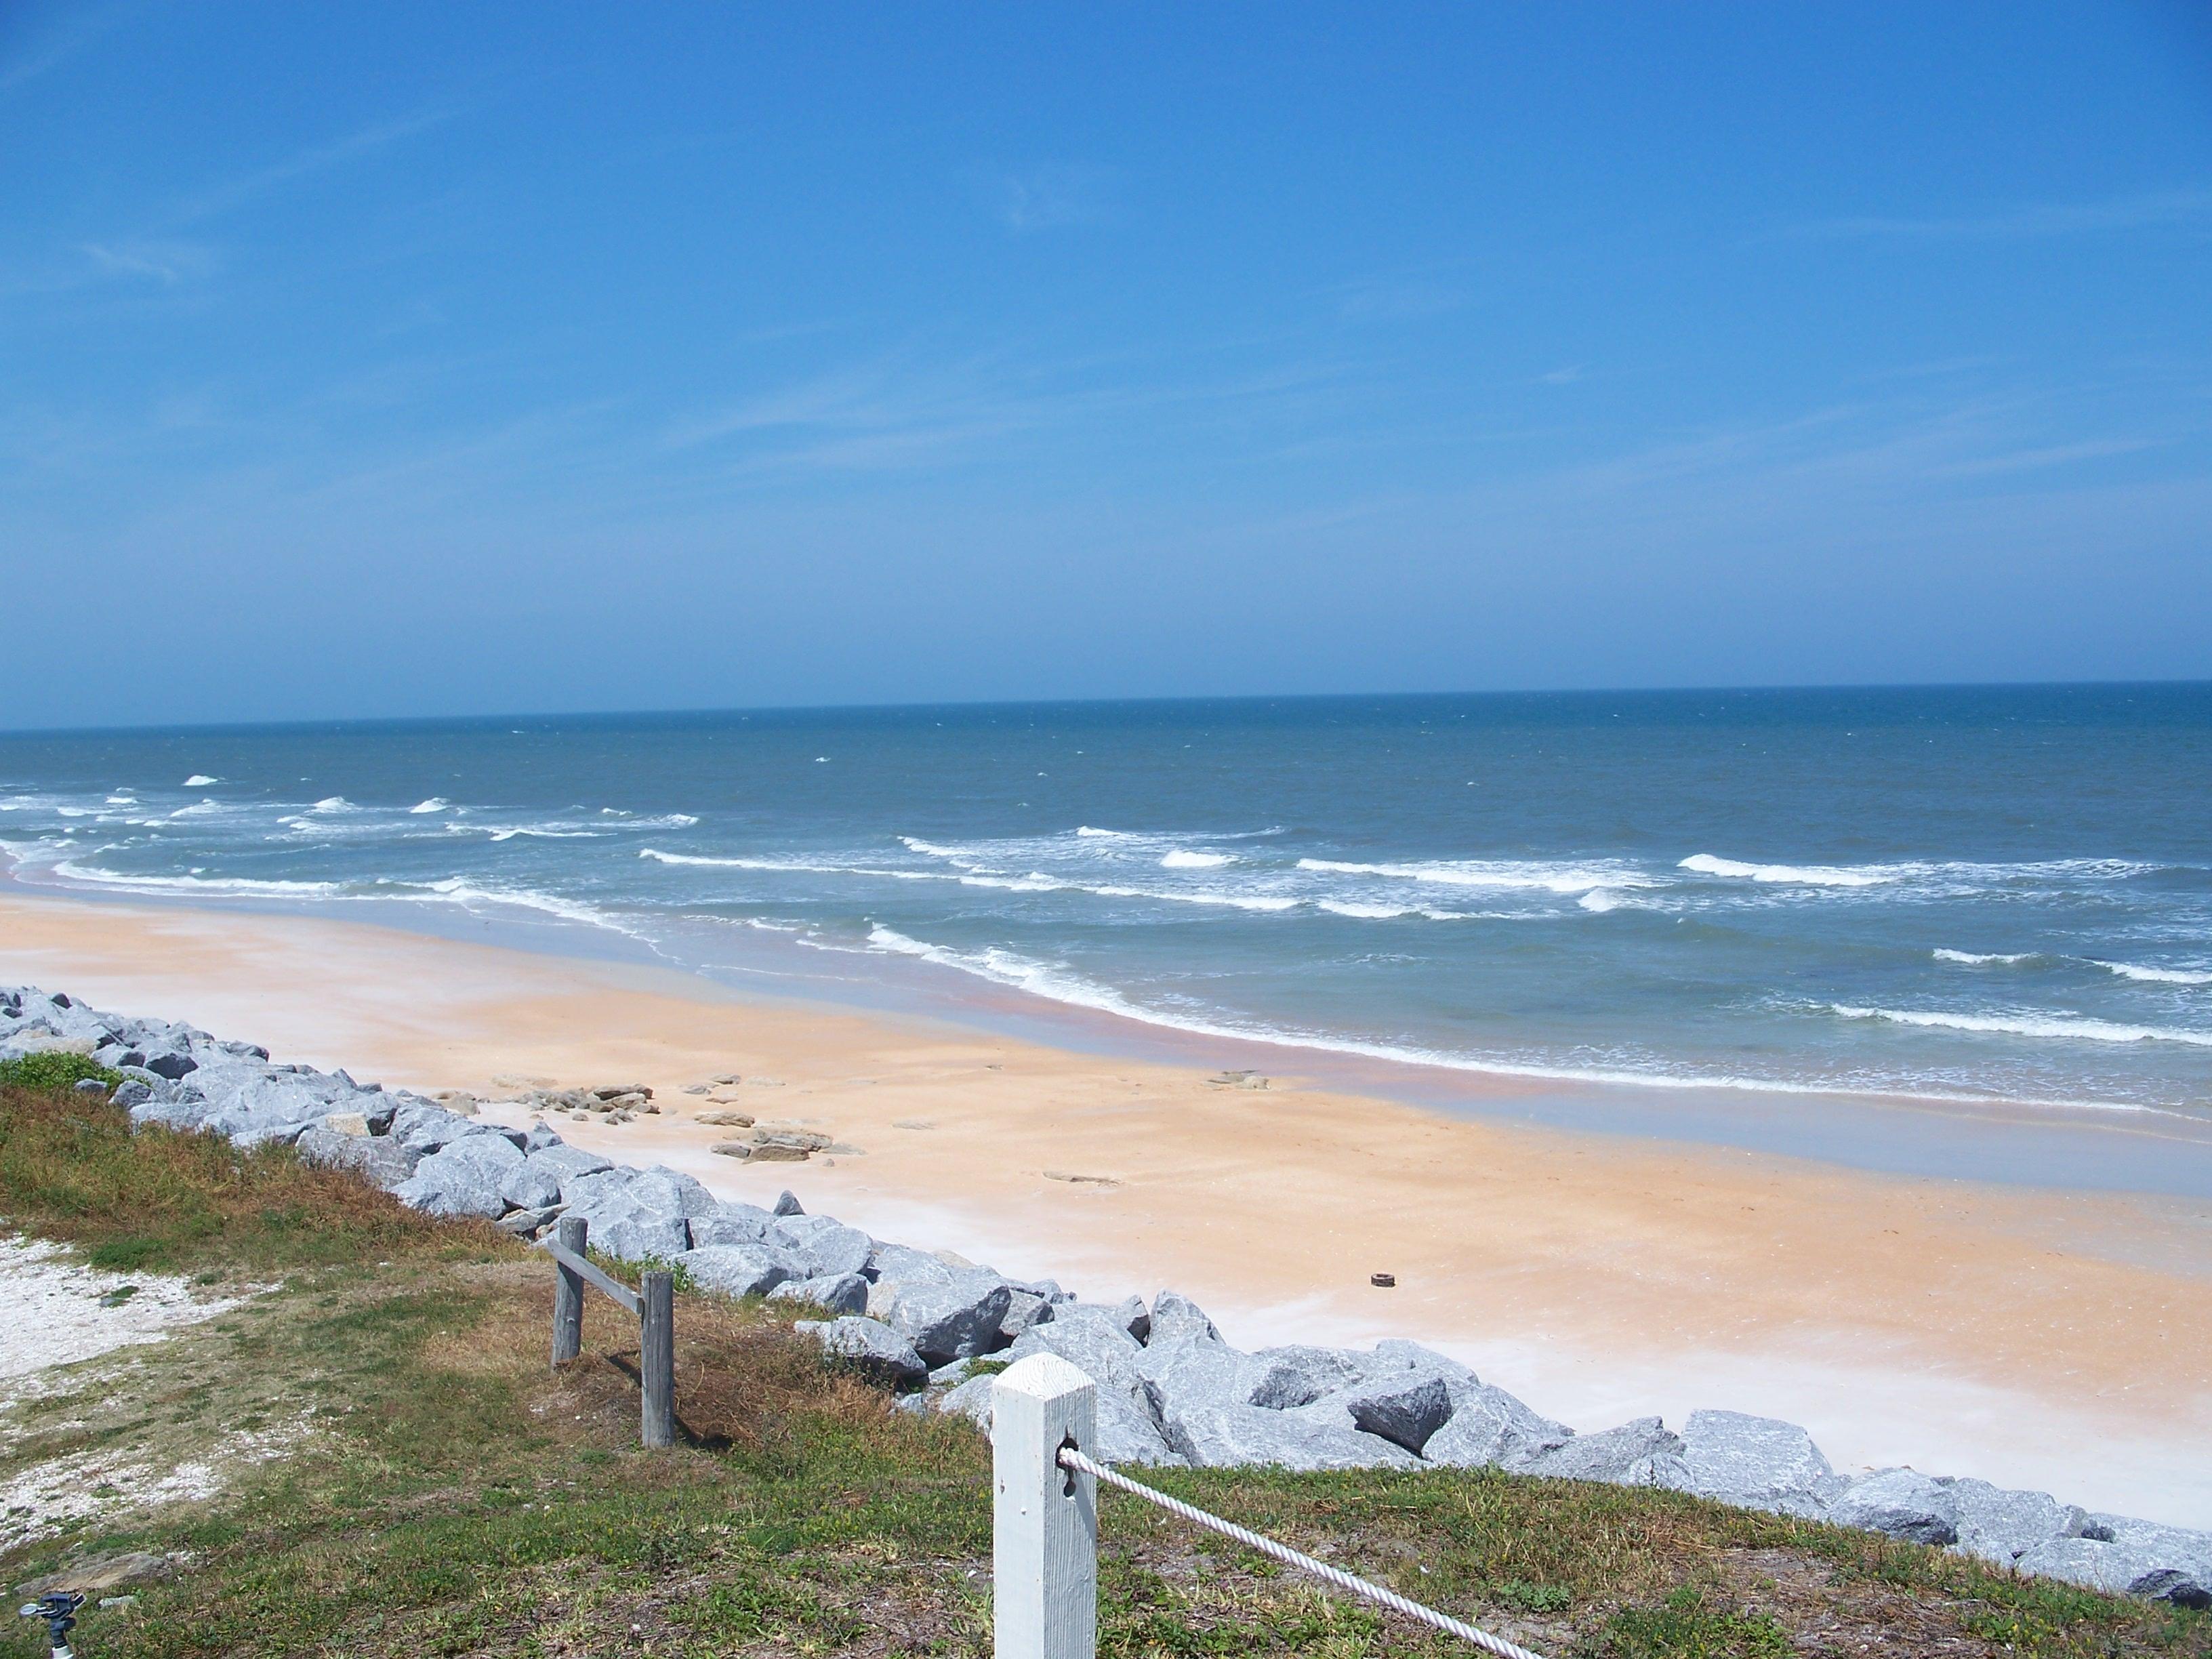 Файл:FL Marineland beach02.jpg — Вікіпедія